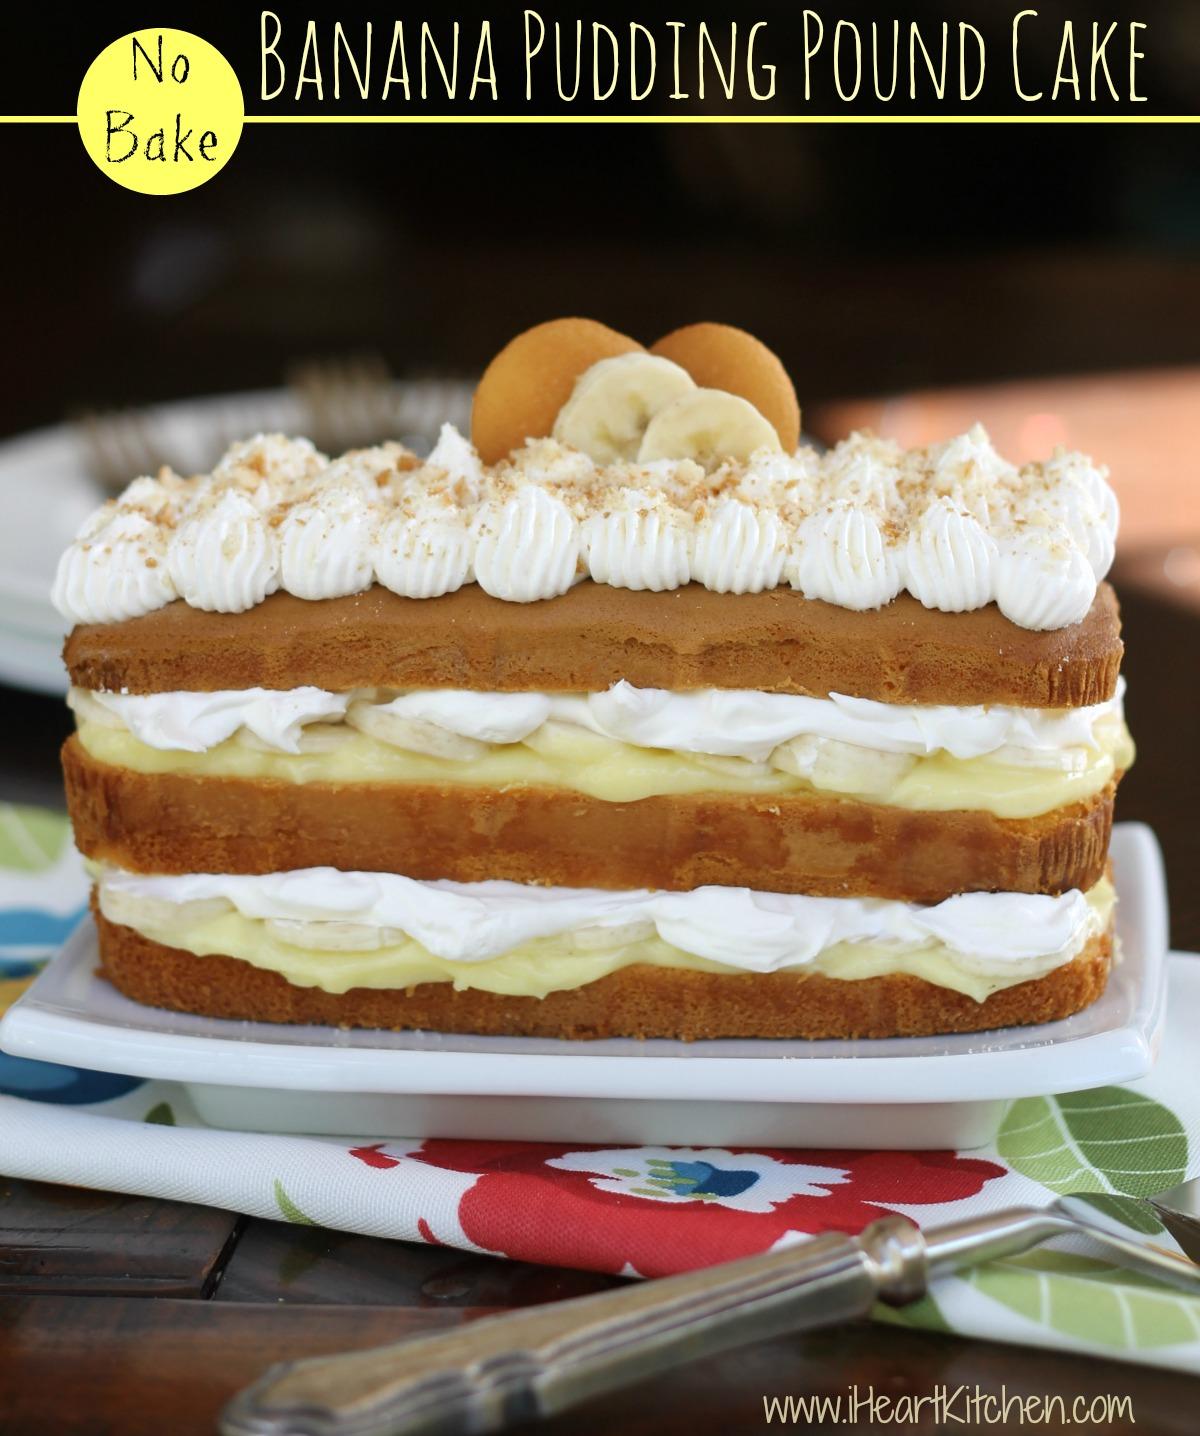 No-Bake-Banana-Pudding-Pound-Cake